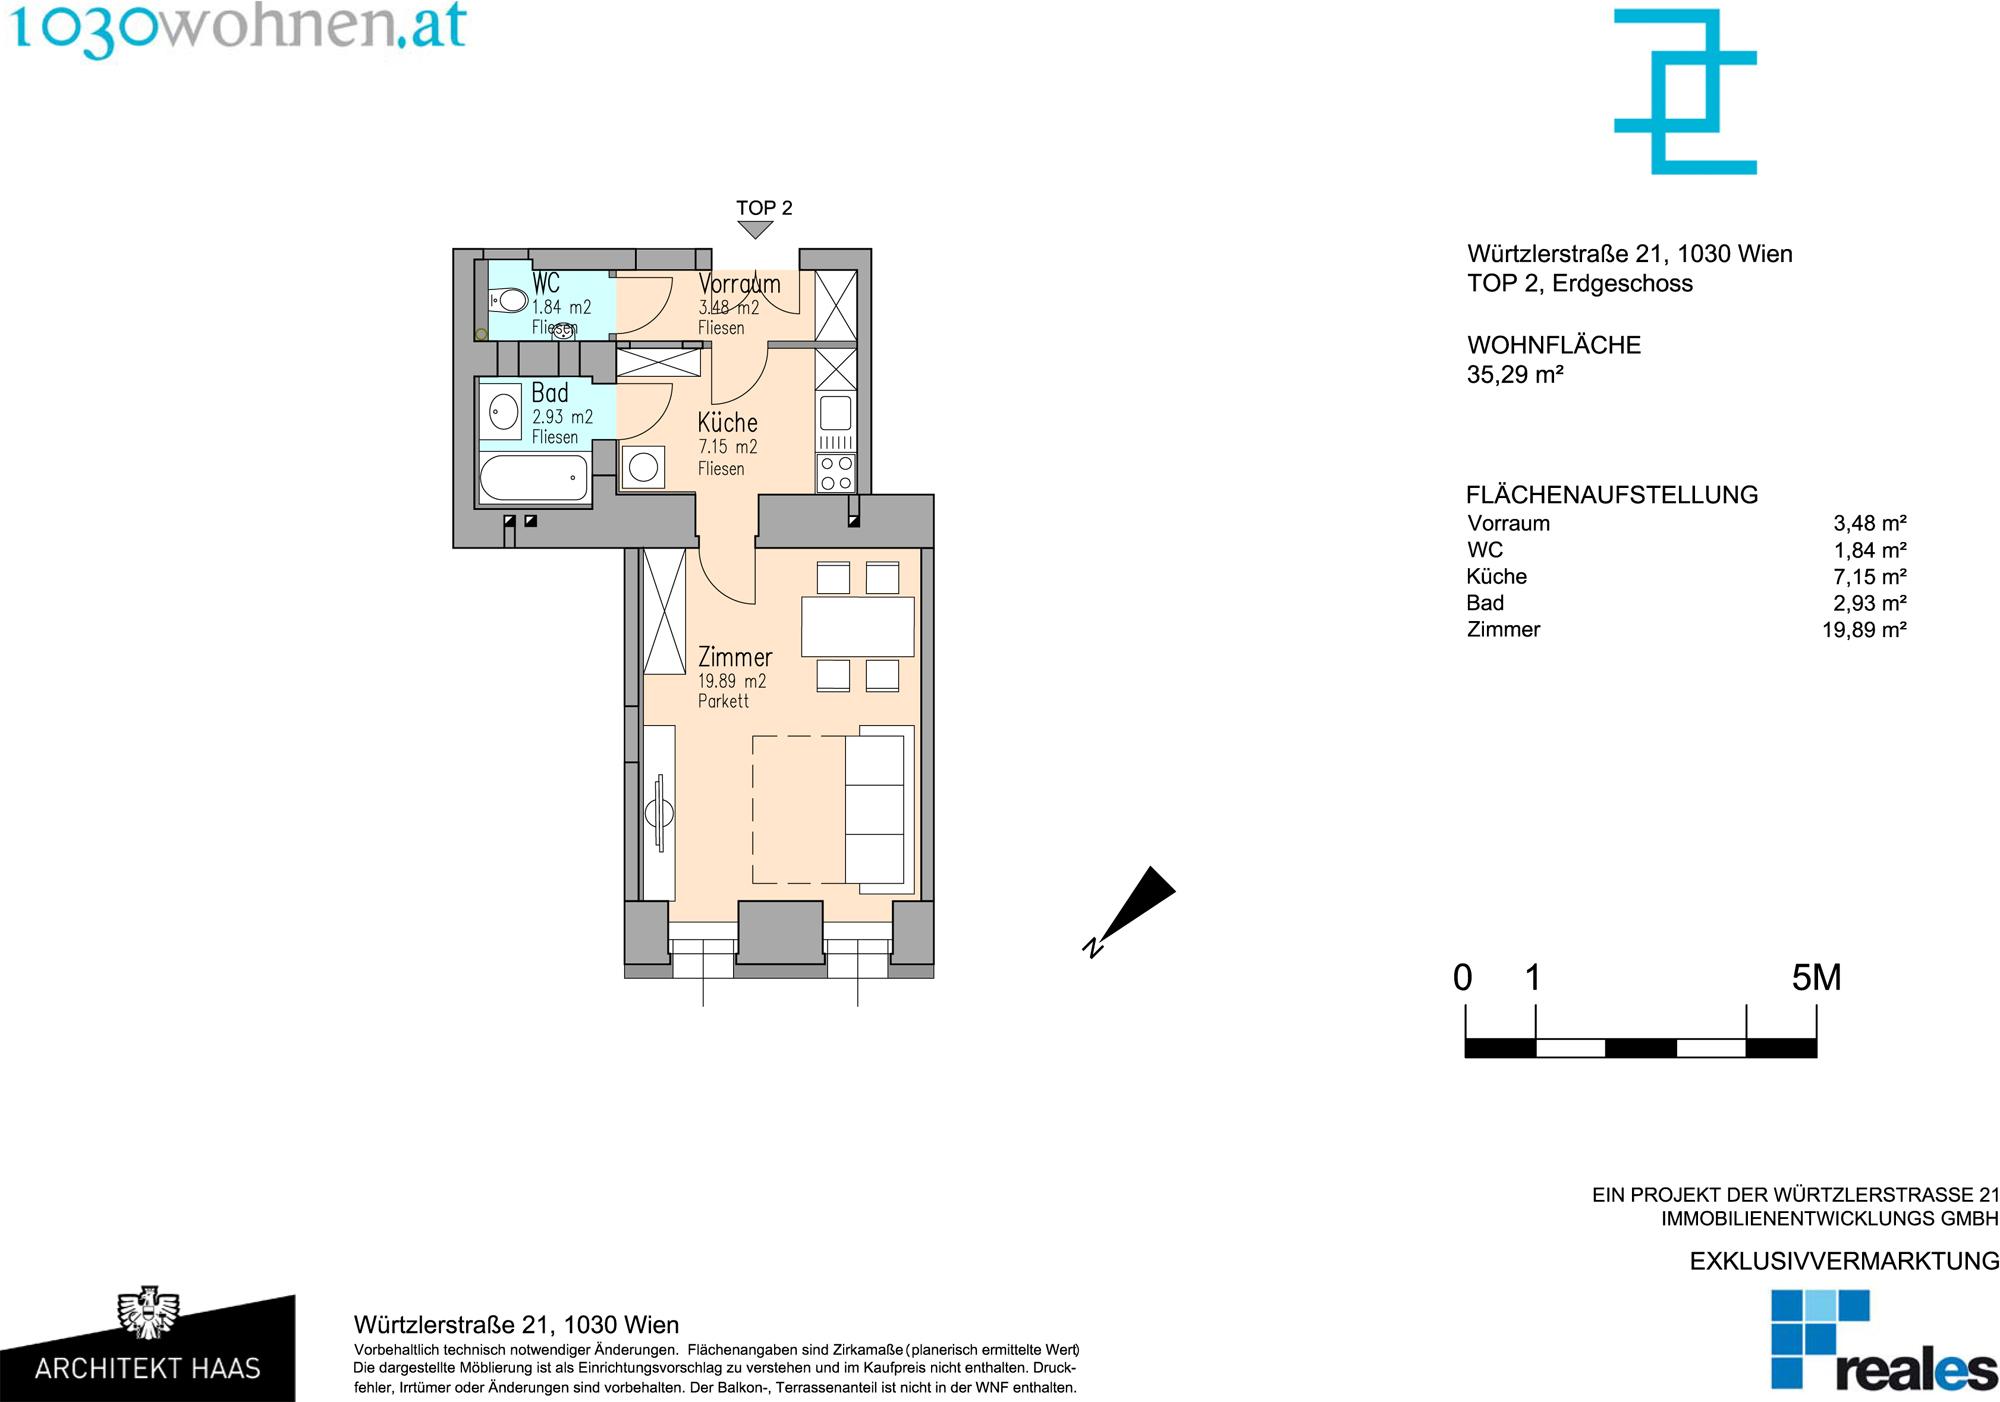 Z:Martin Haas ArchitectsProjekte�9420_CAD1200_Verkaufsplan